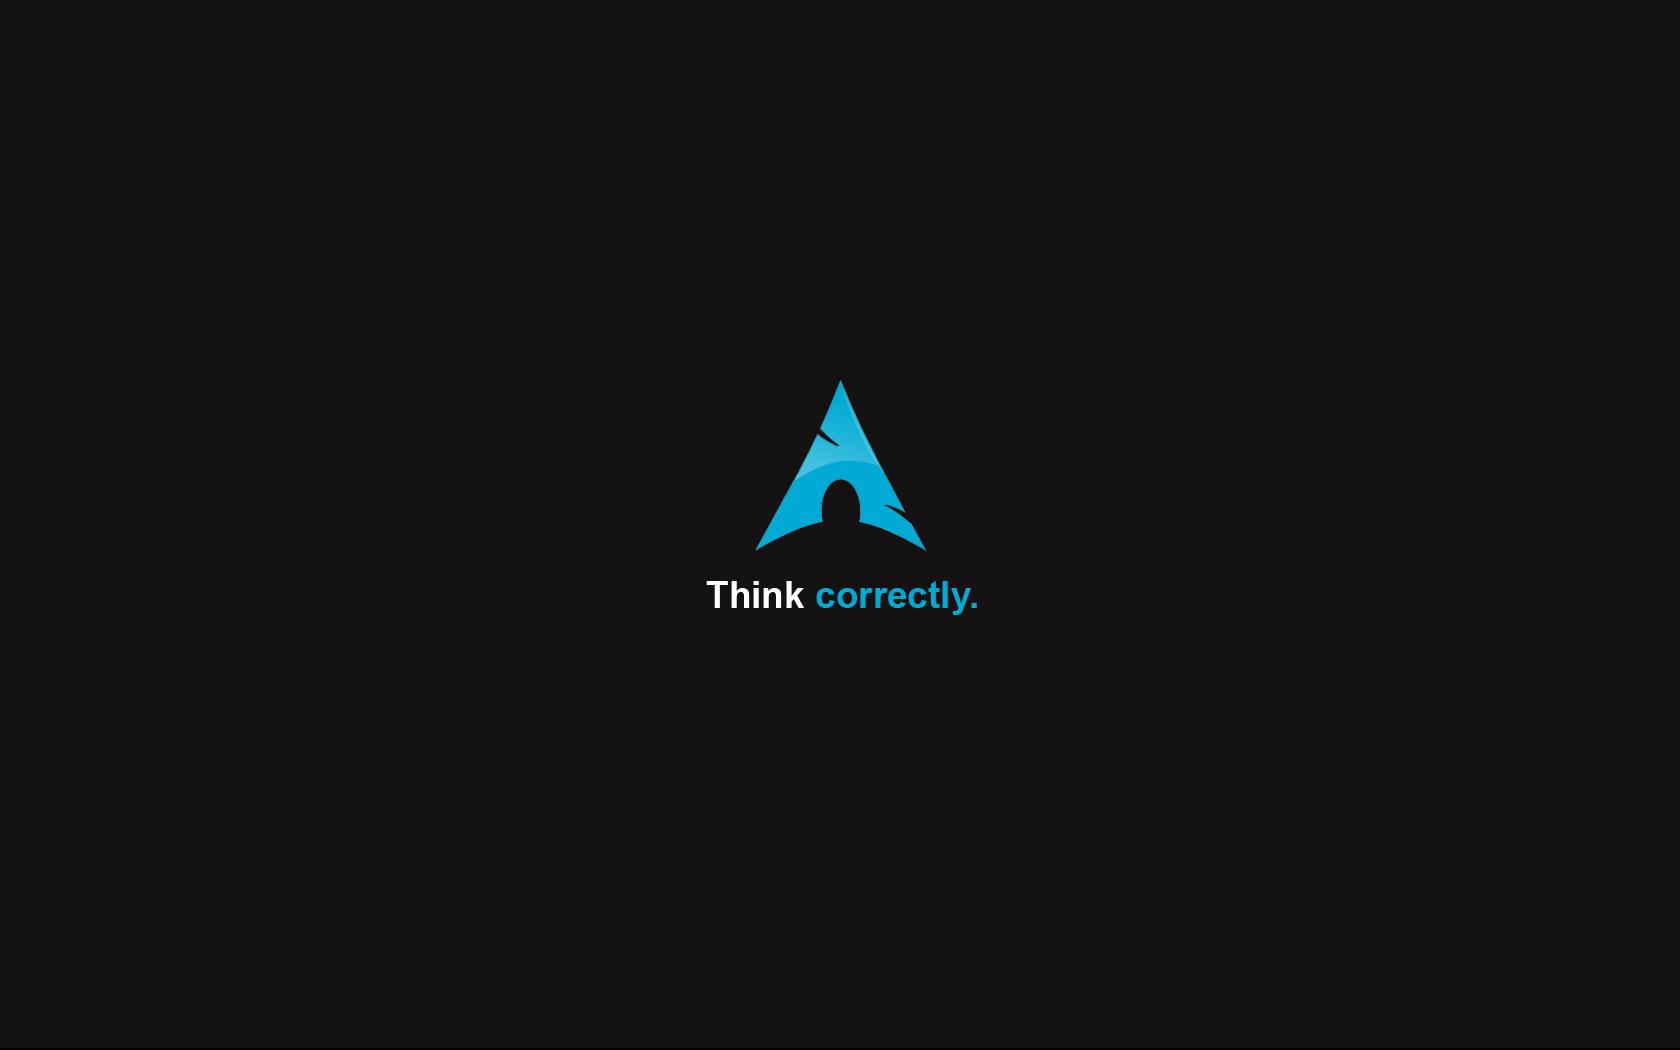 Arch Linux Art Pirates Wizards Penguins 1680x1050